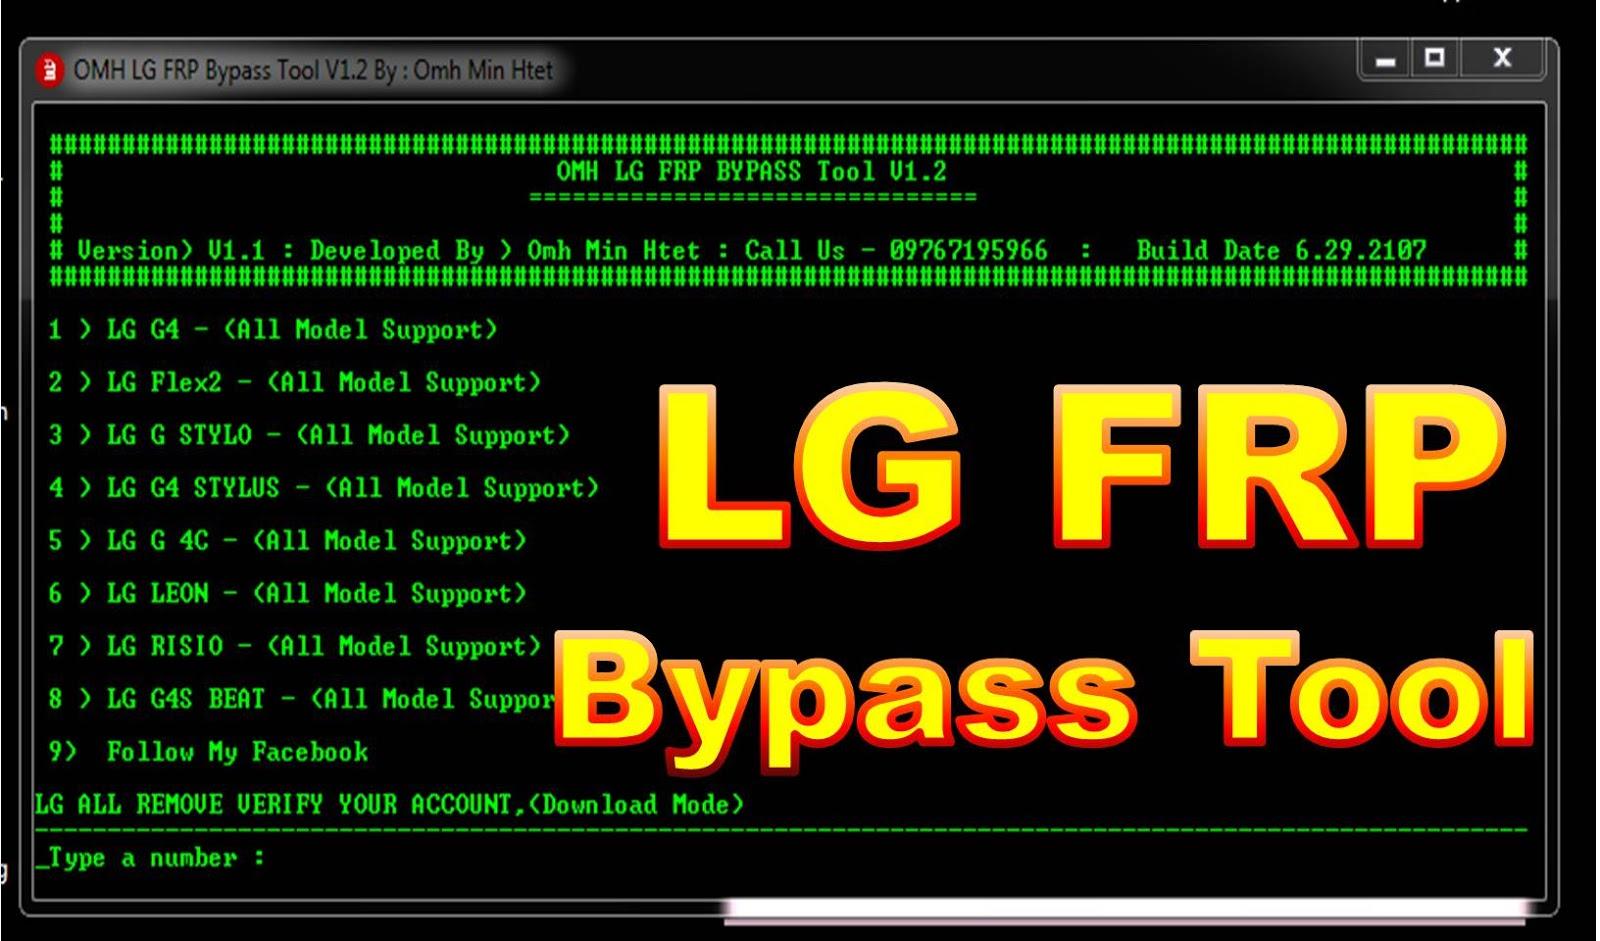 OMH Frp Bypass Tool V1 2 latest Update By MobileflasherBD R Jonaki